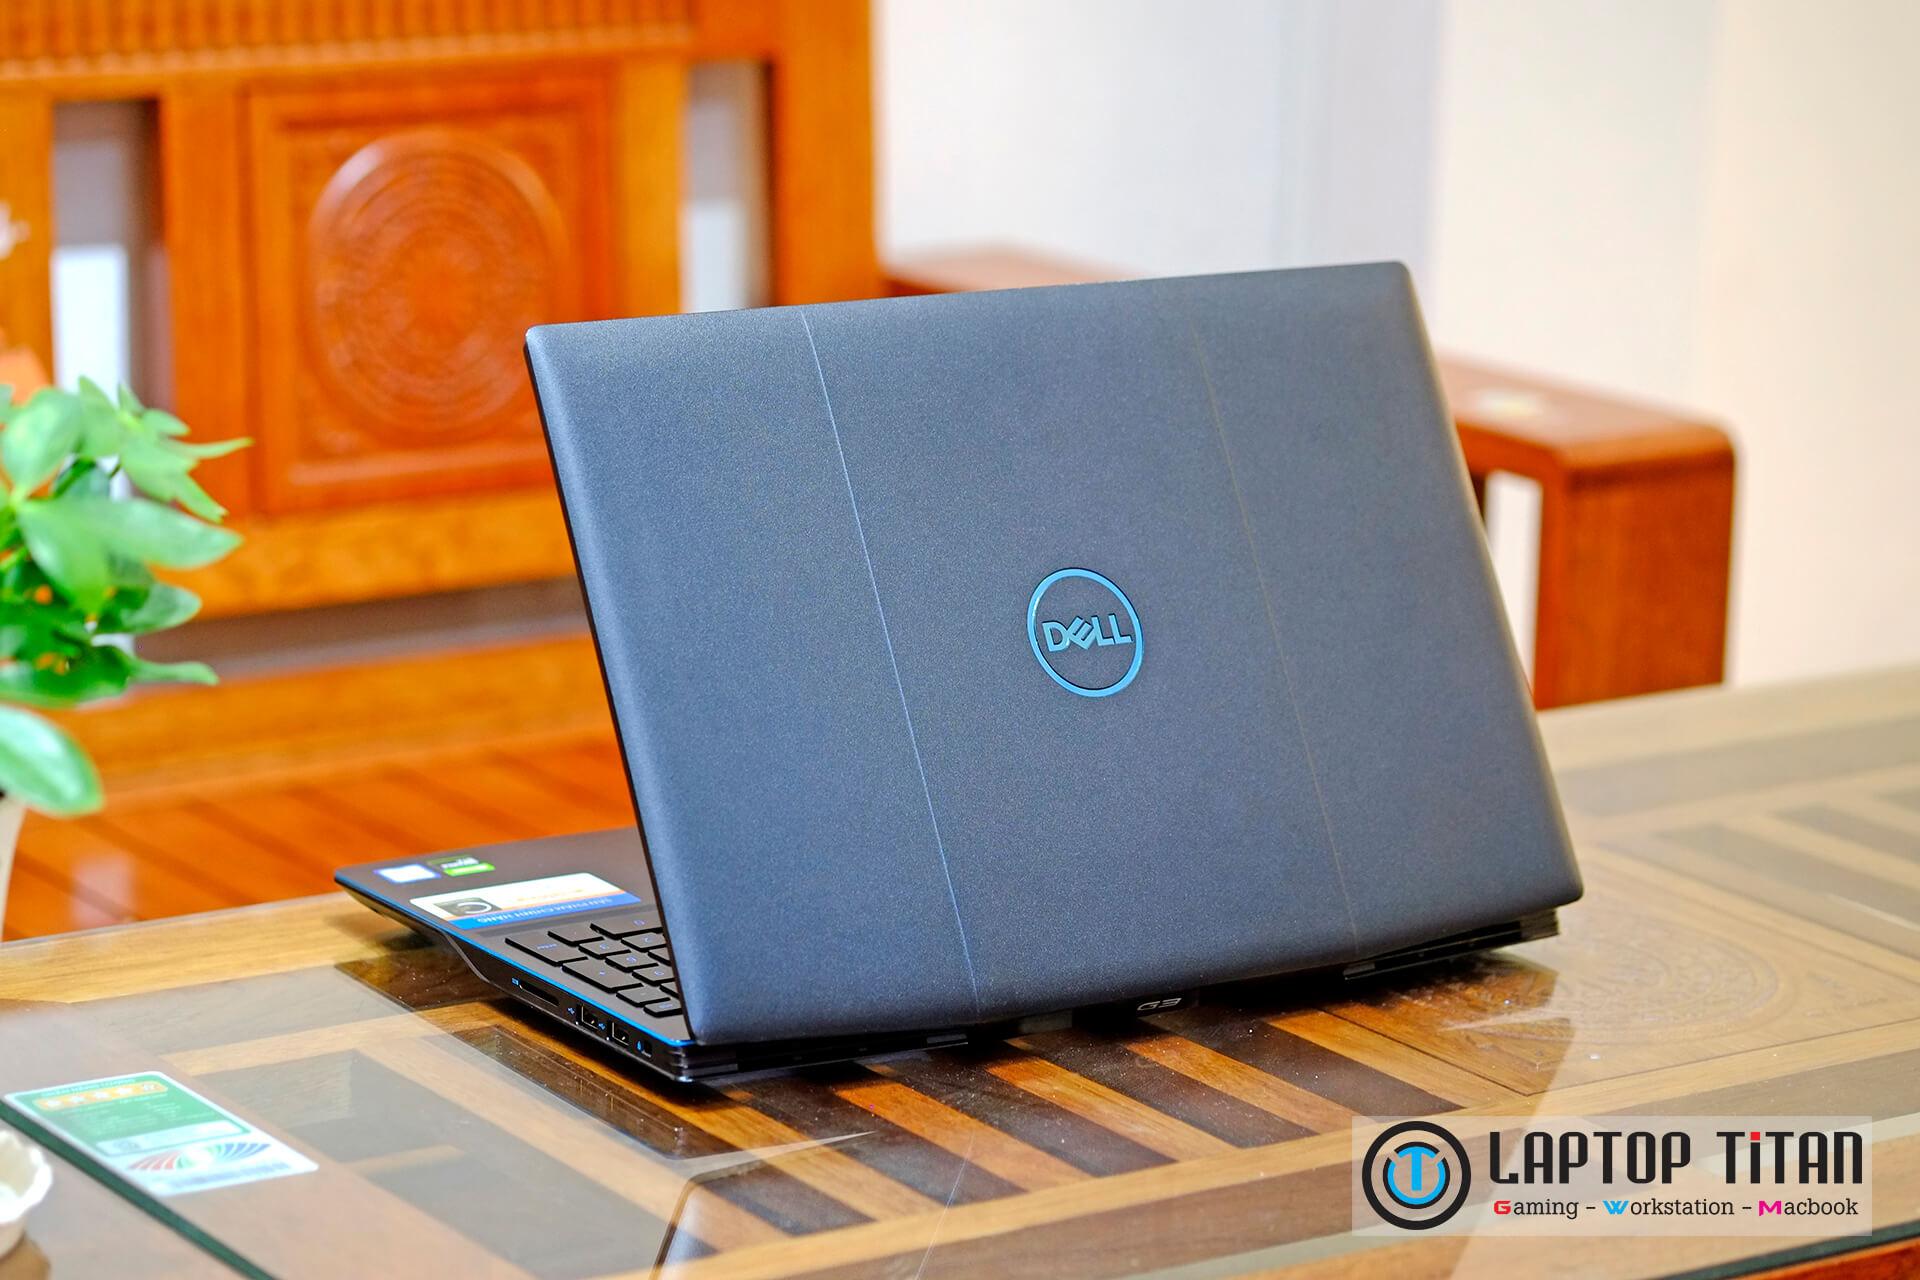 "Dell G3 3590 i7 9750H / 16GB / 512GB + 1TB / GTX 1660Ti 6GB / 15.6"" FHD IPS / New 99%"